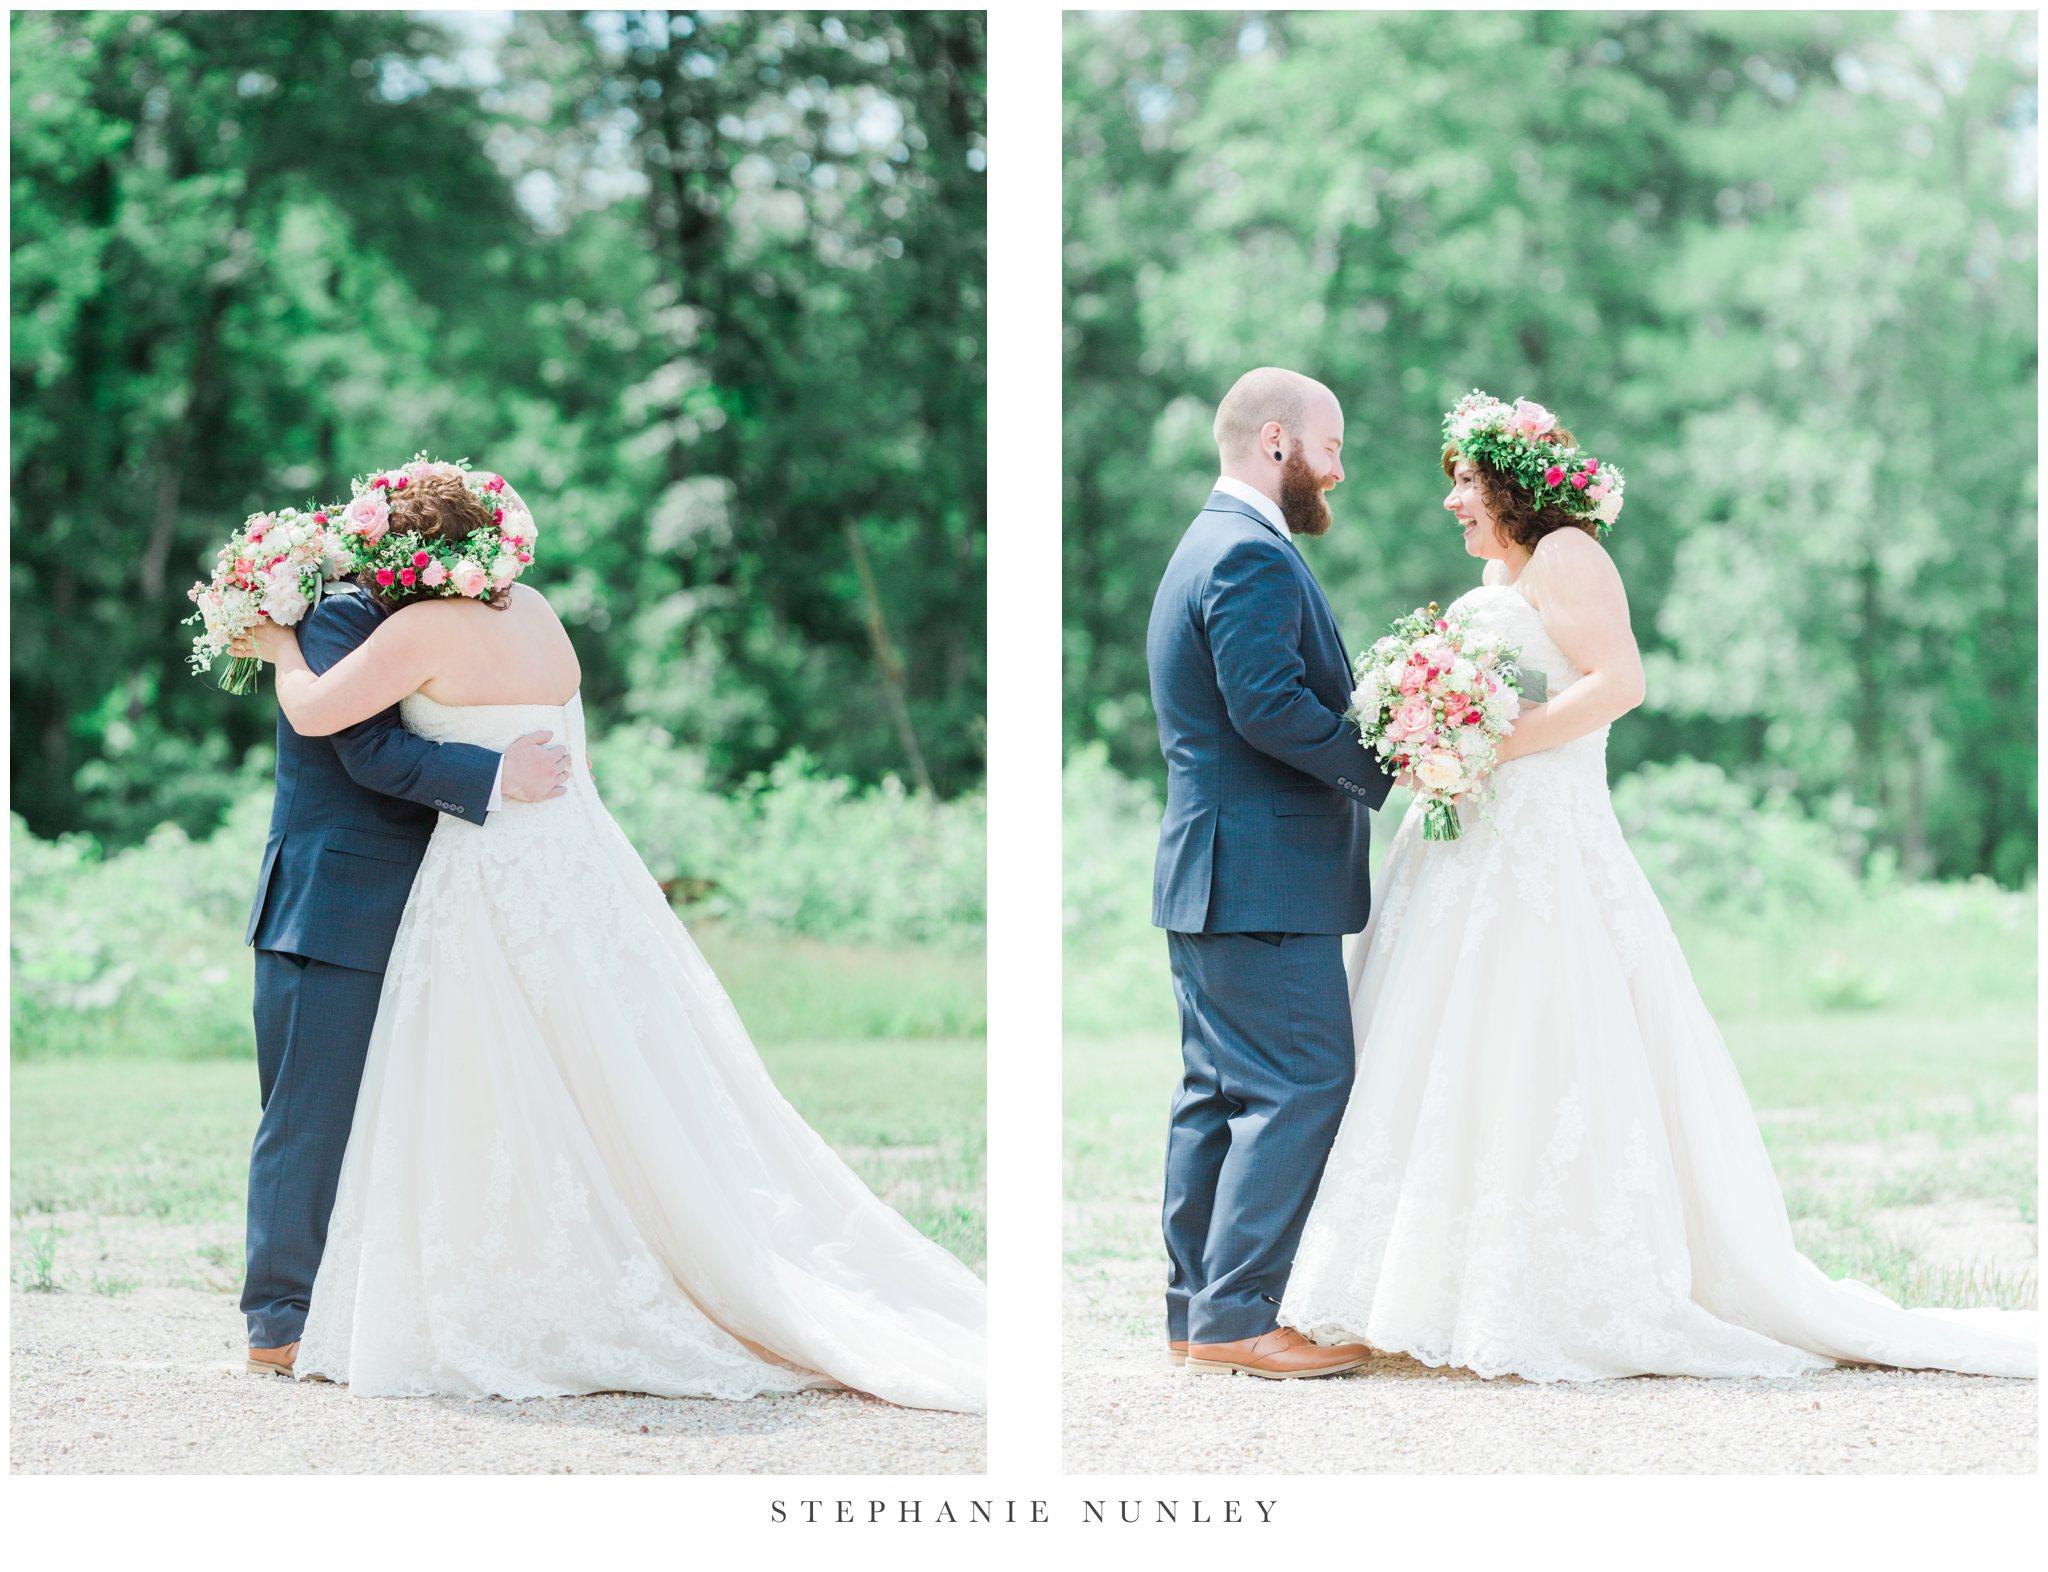 romantic-outdoor-wedding-with-flower-crown-0029.jpg